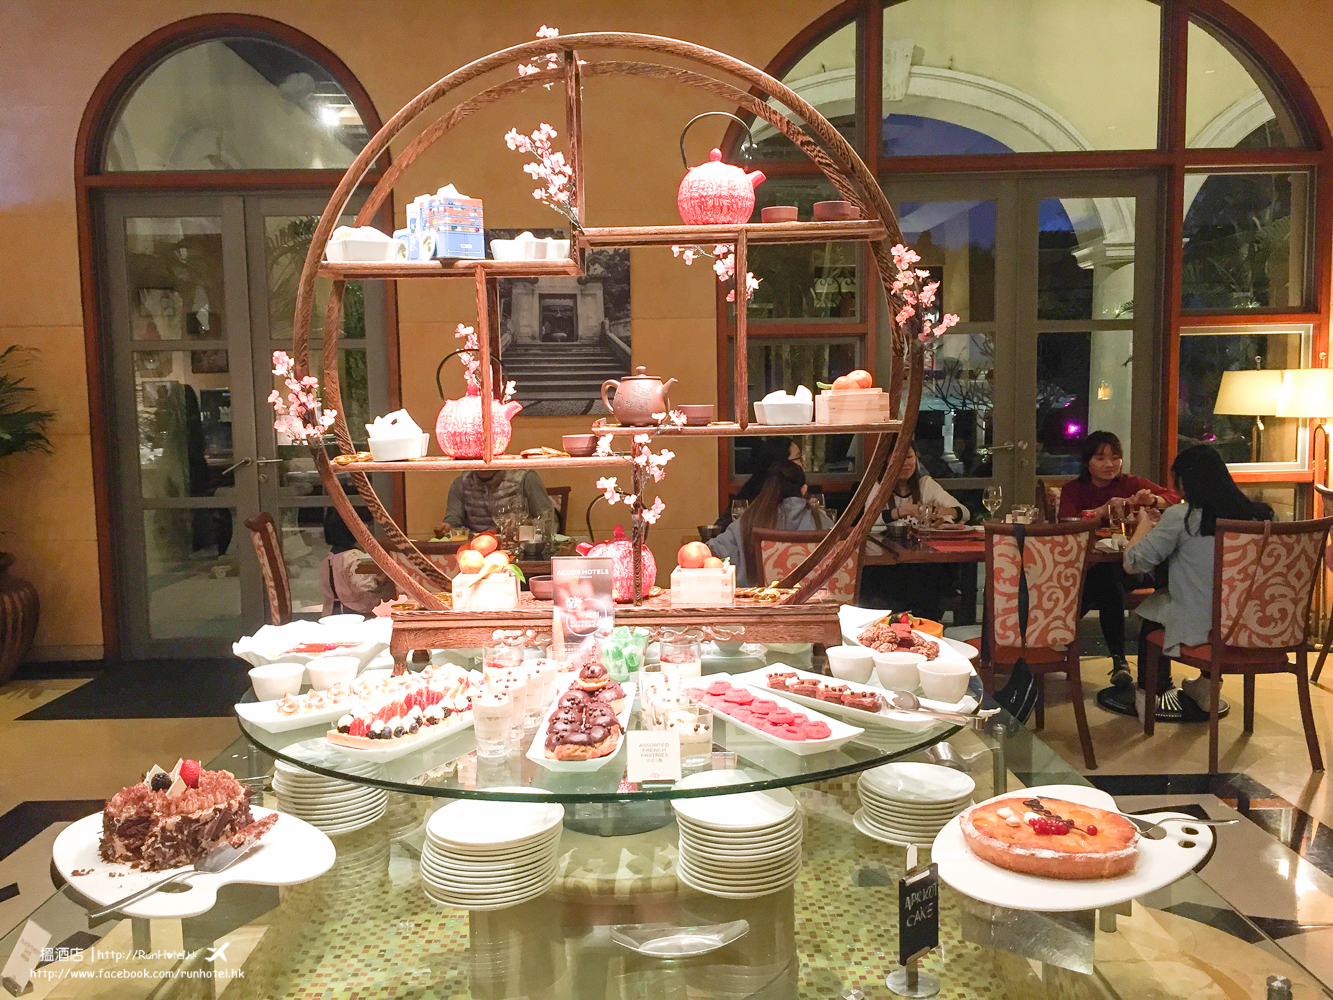 sofitel buffet Macau (35)